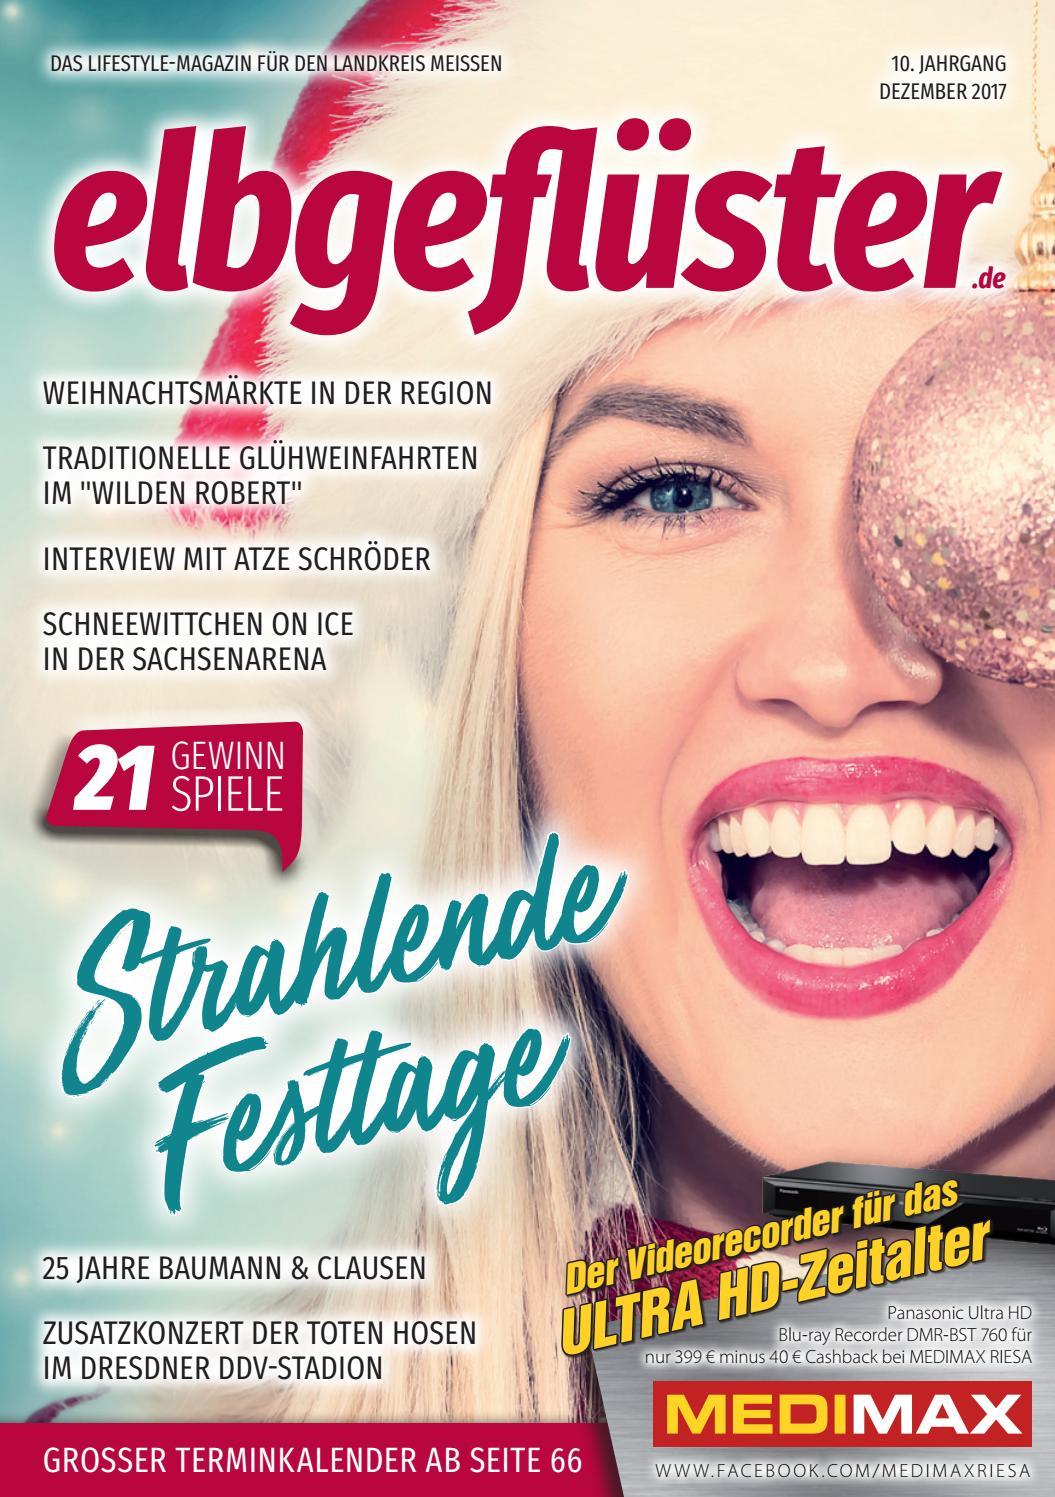 Elbgeflüster Dezember 2017 by Elbgeflüster - issuu